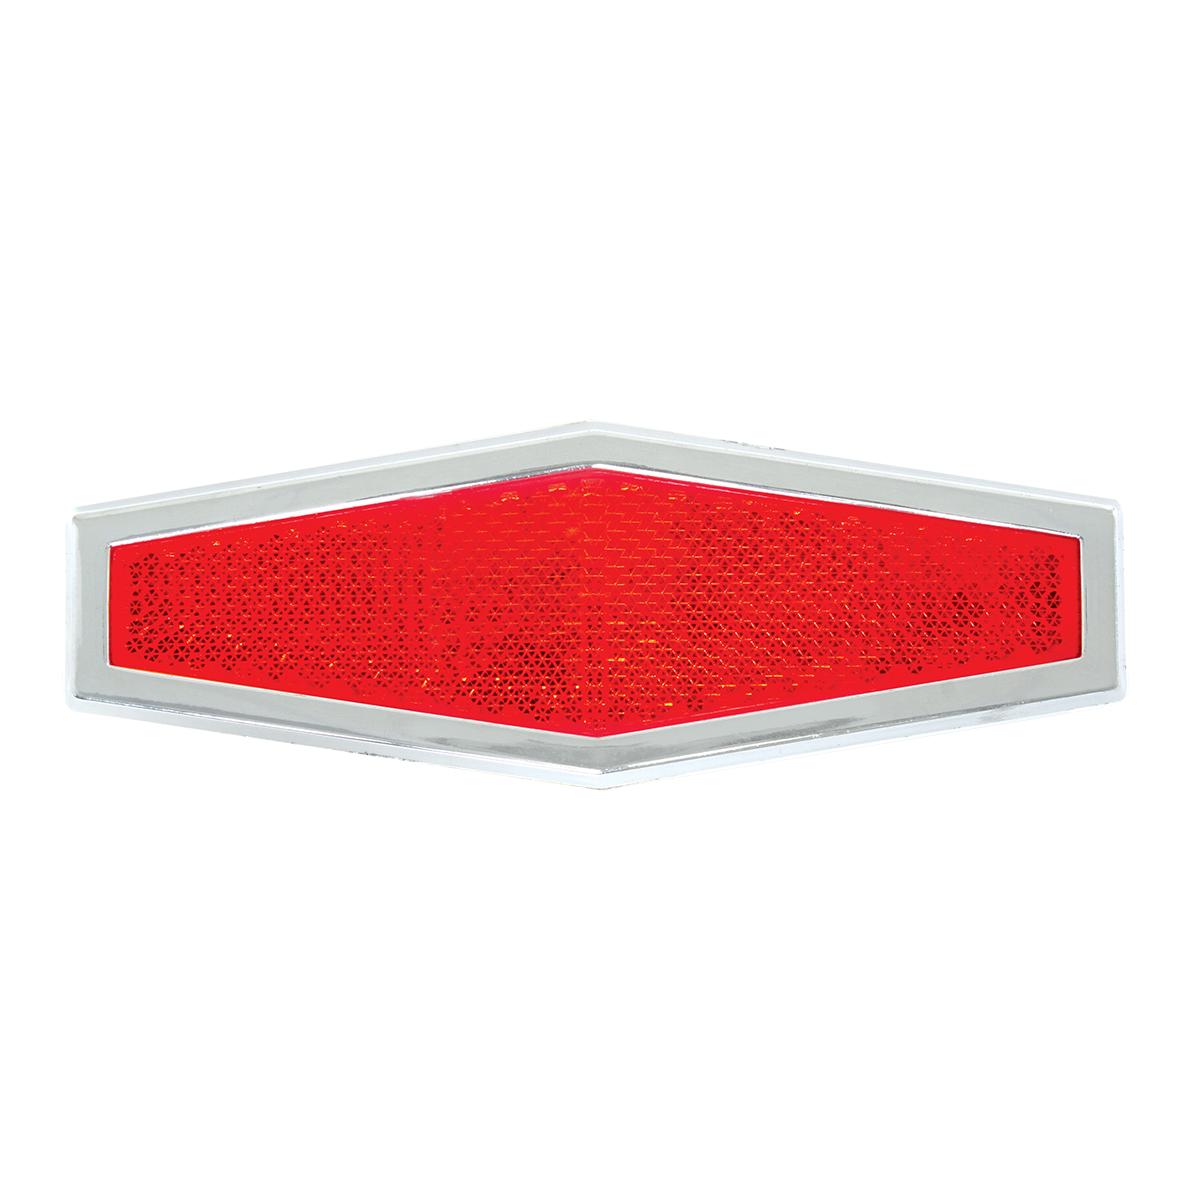 80864 Red Diamond Shape Stick-On Reflector w/ Chrome Trim